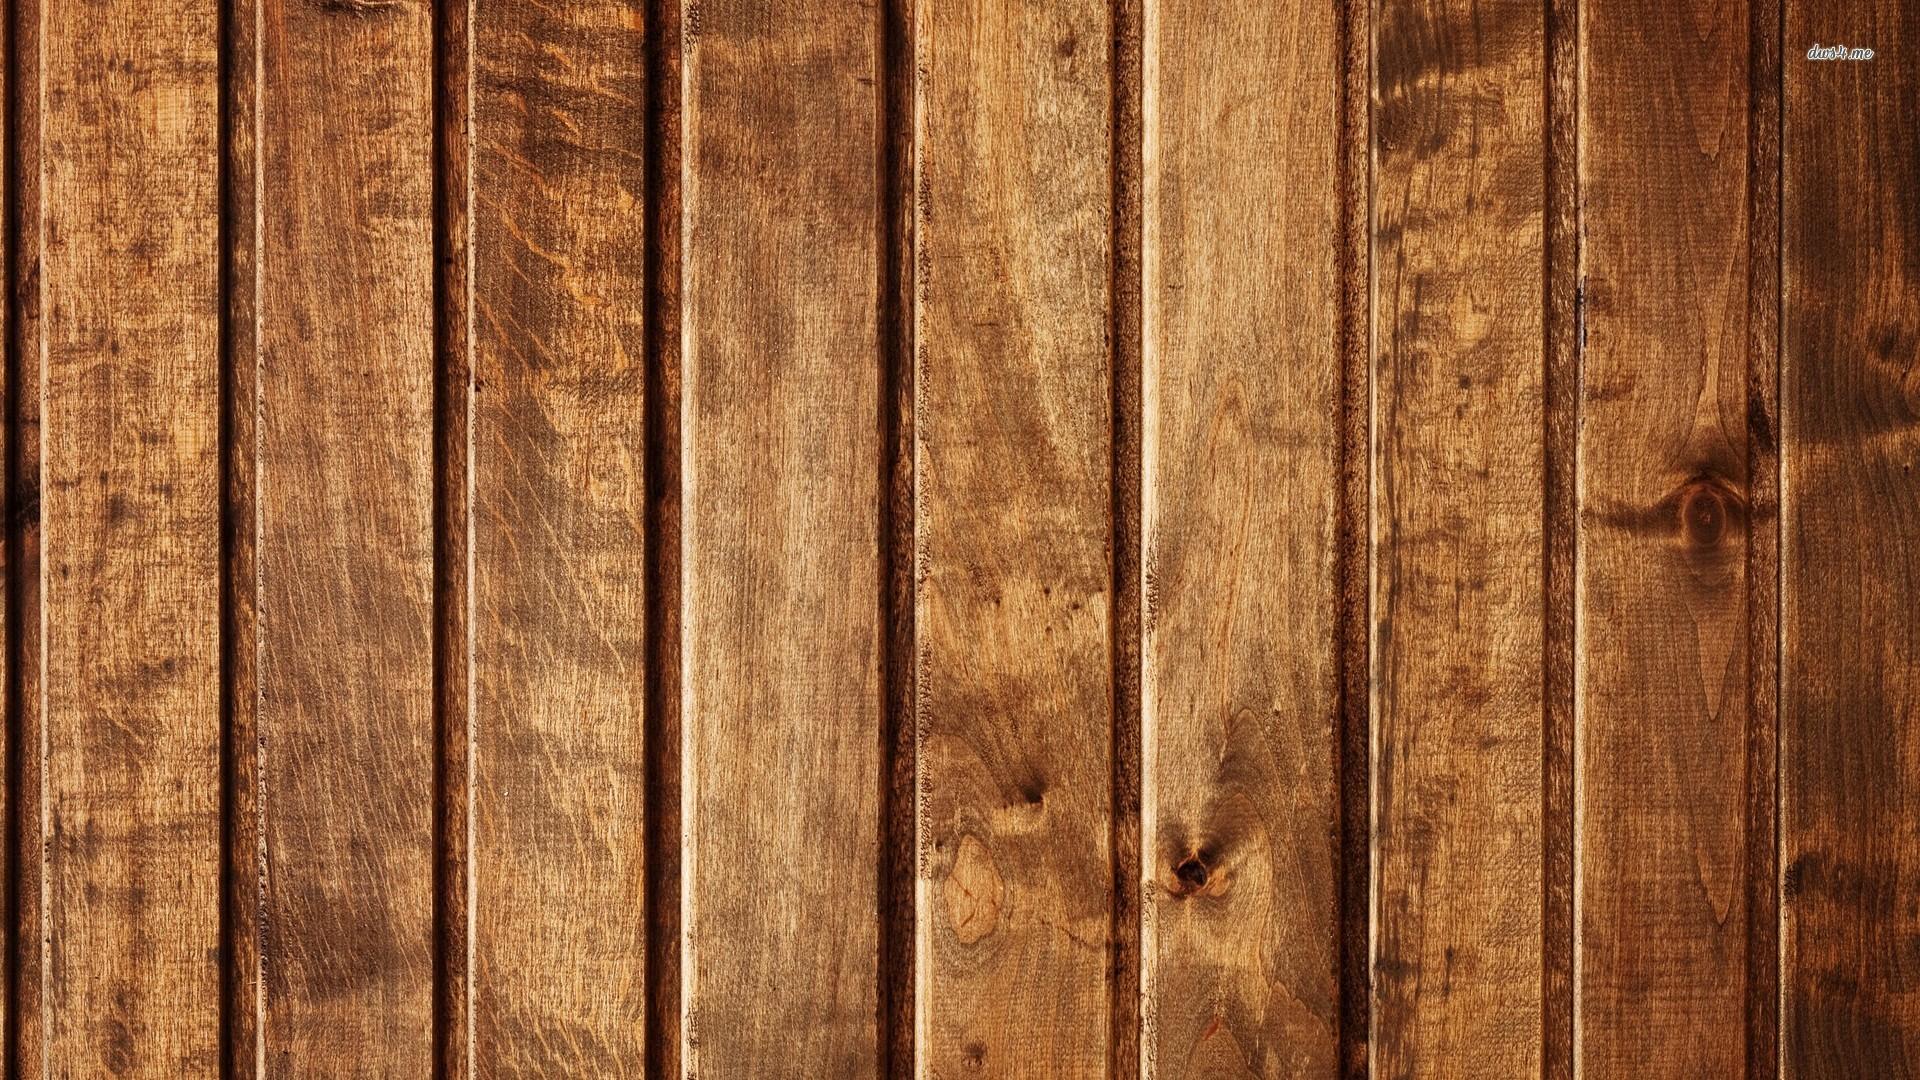 Hd Wood Texture Wallpaper